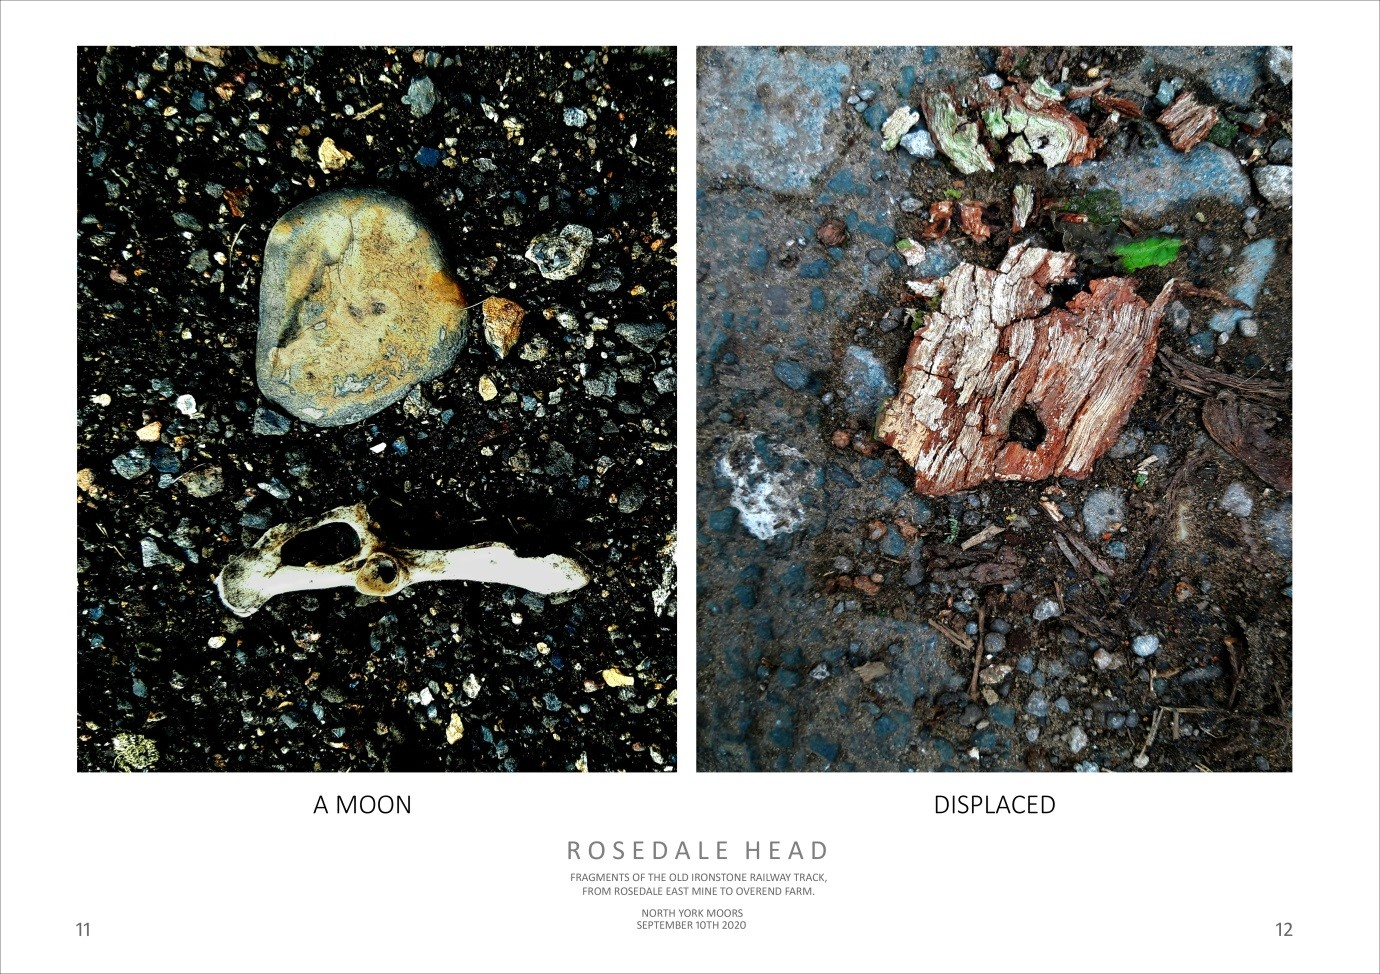 ROSEDALE HEAD - A MOON, DISPLACED